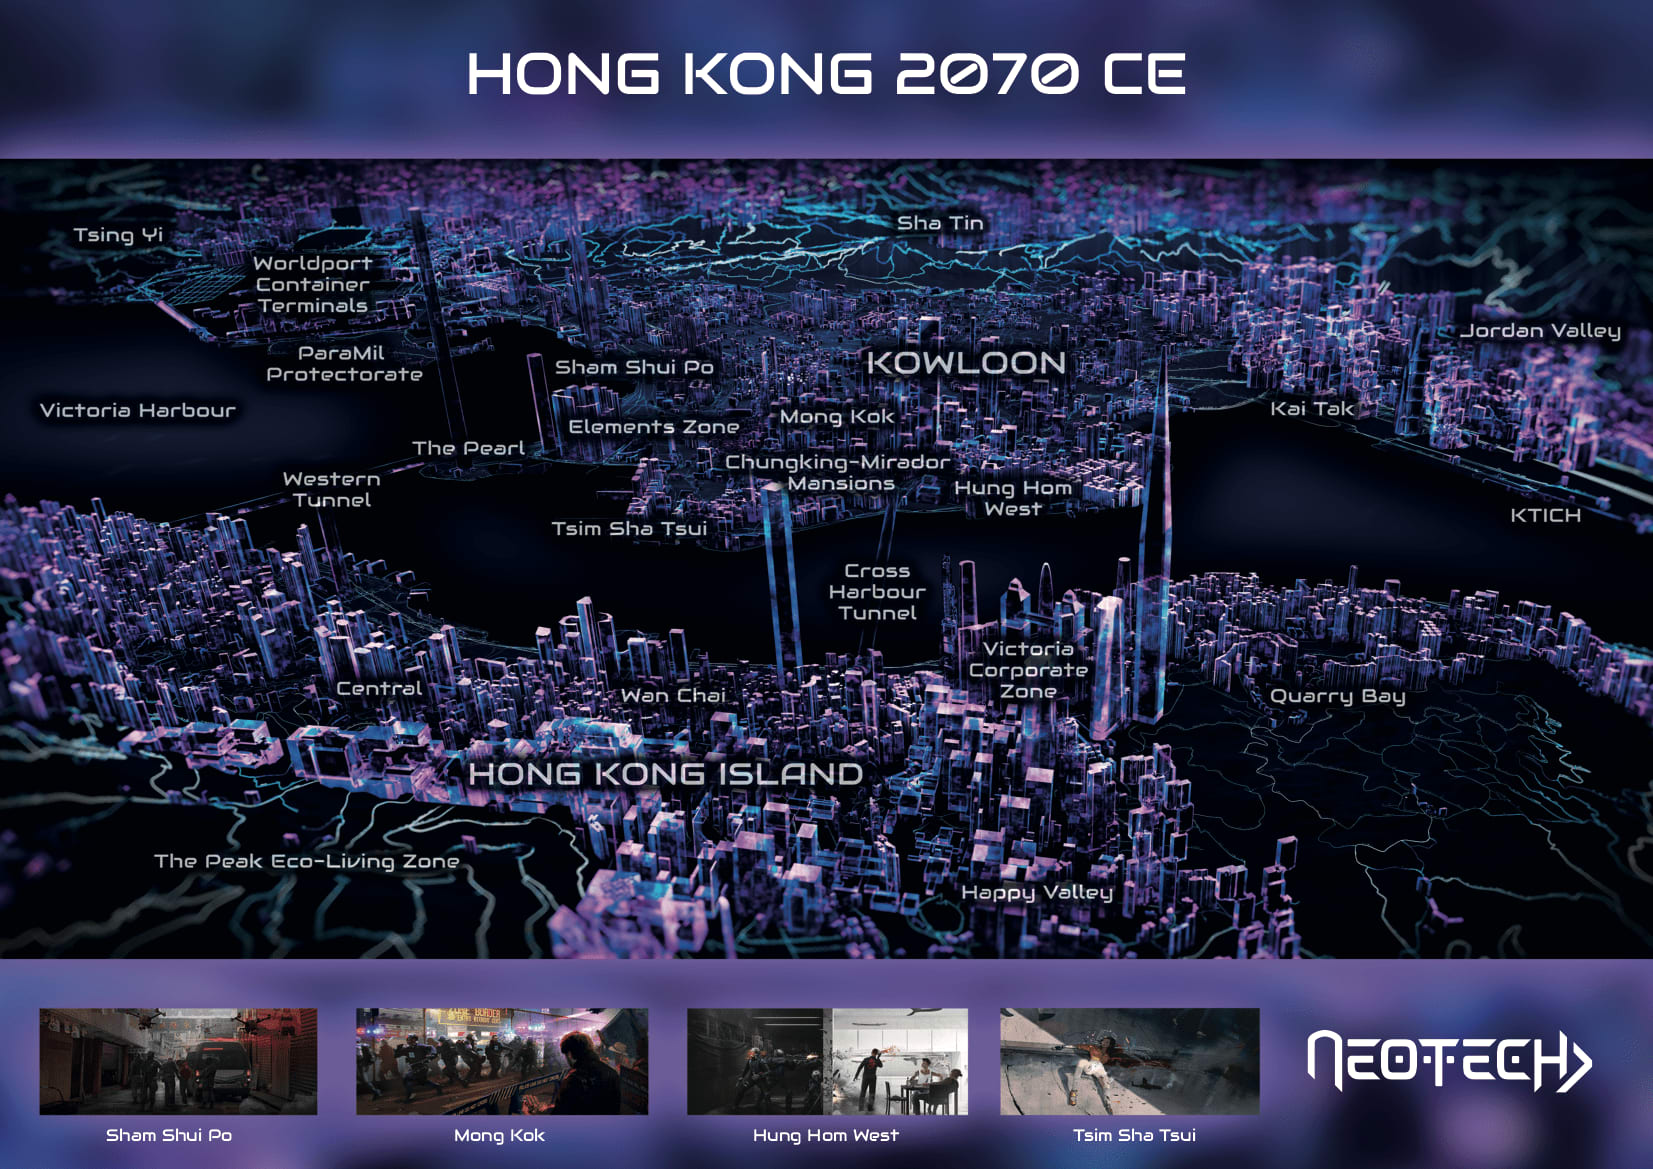 Hong Kong 2070